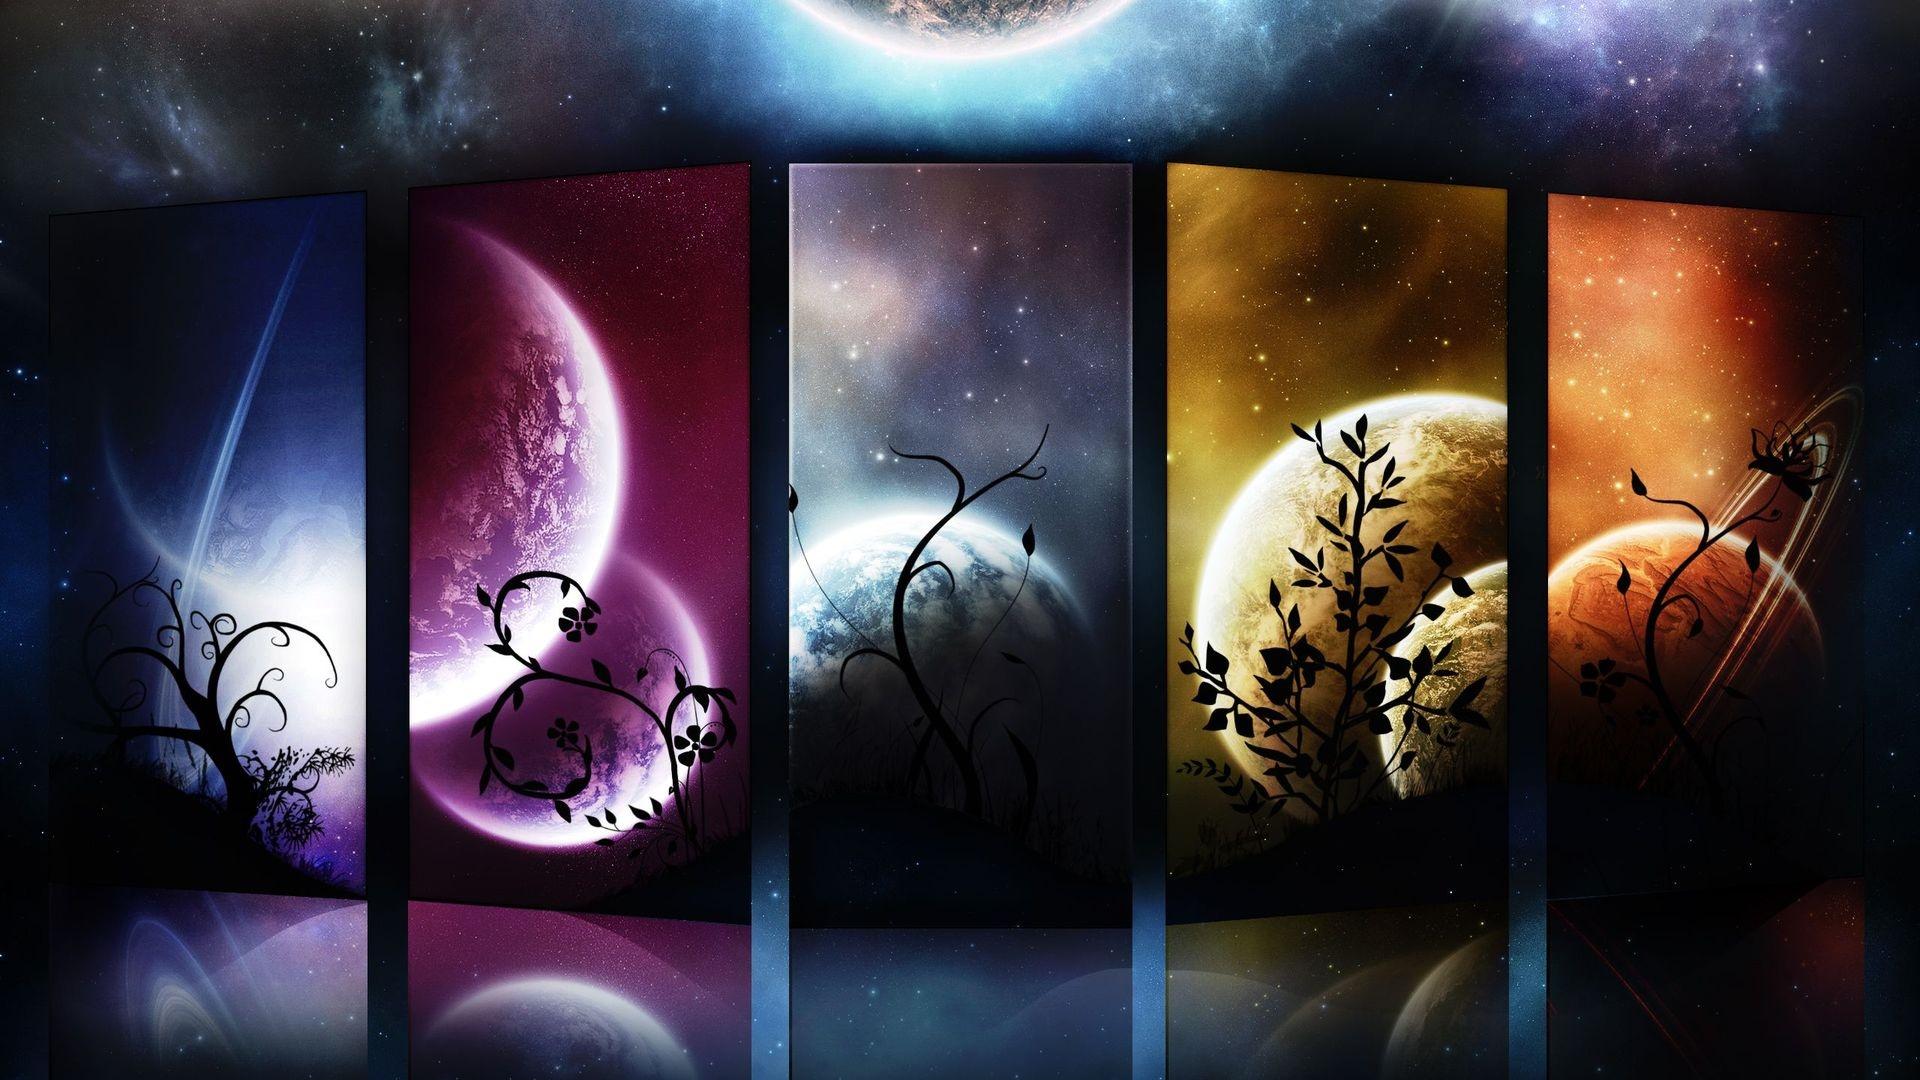 Slice of planets wallpaper